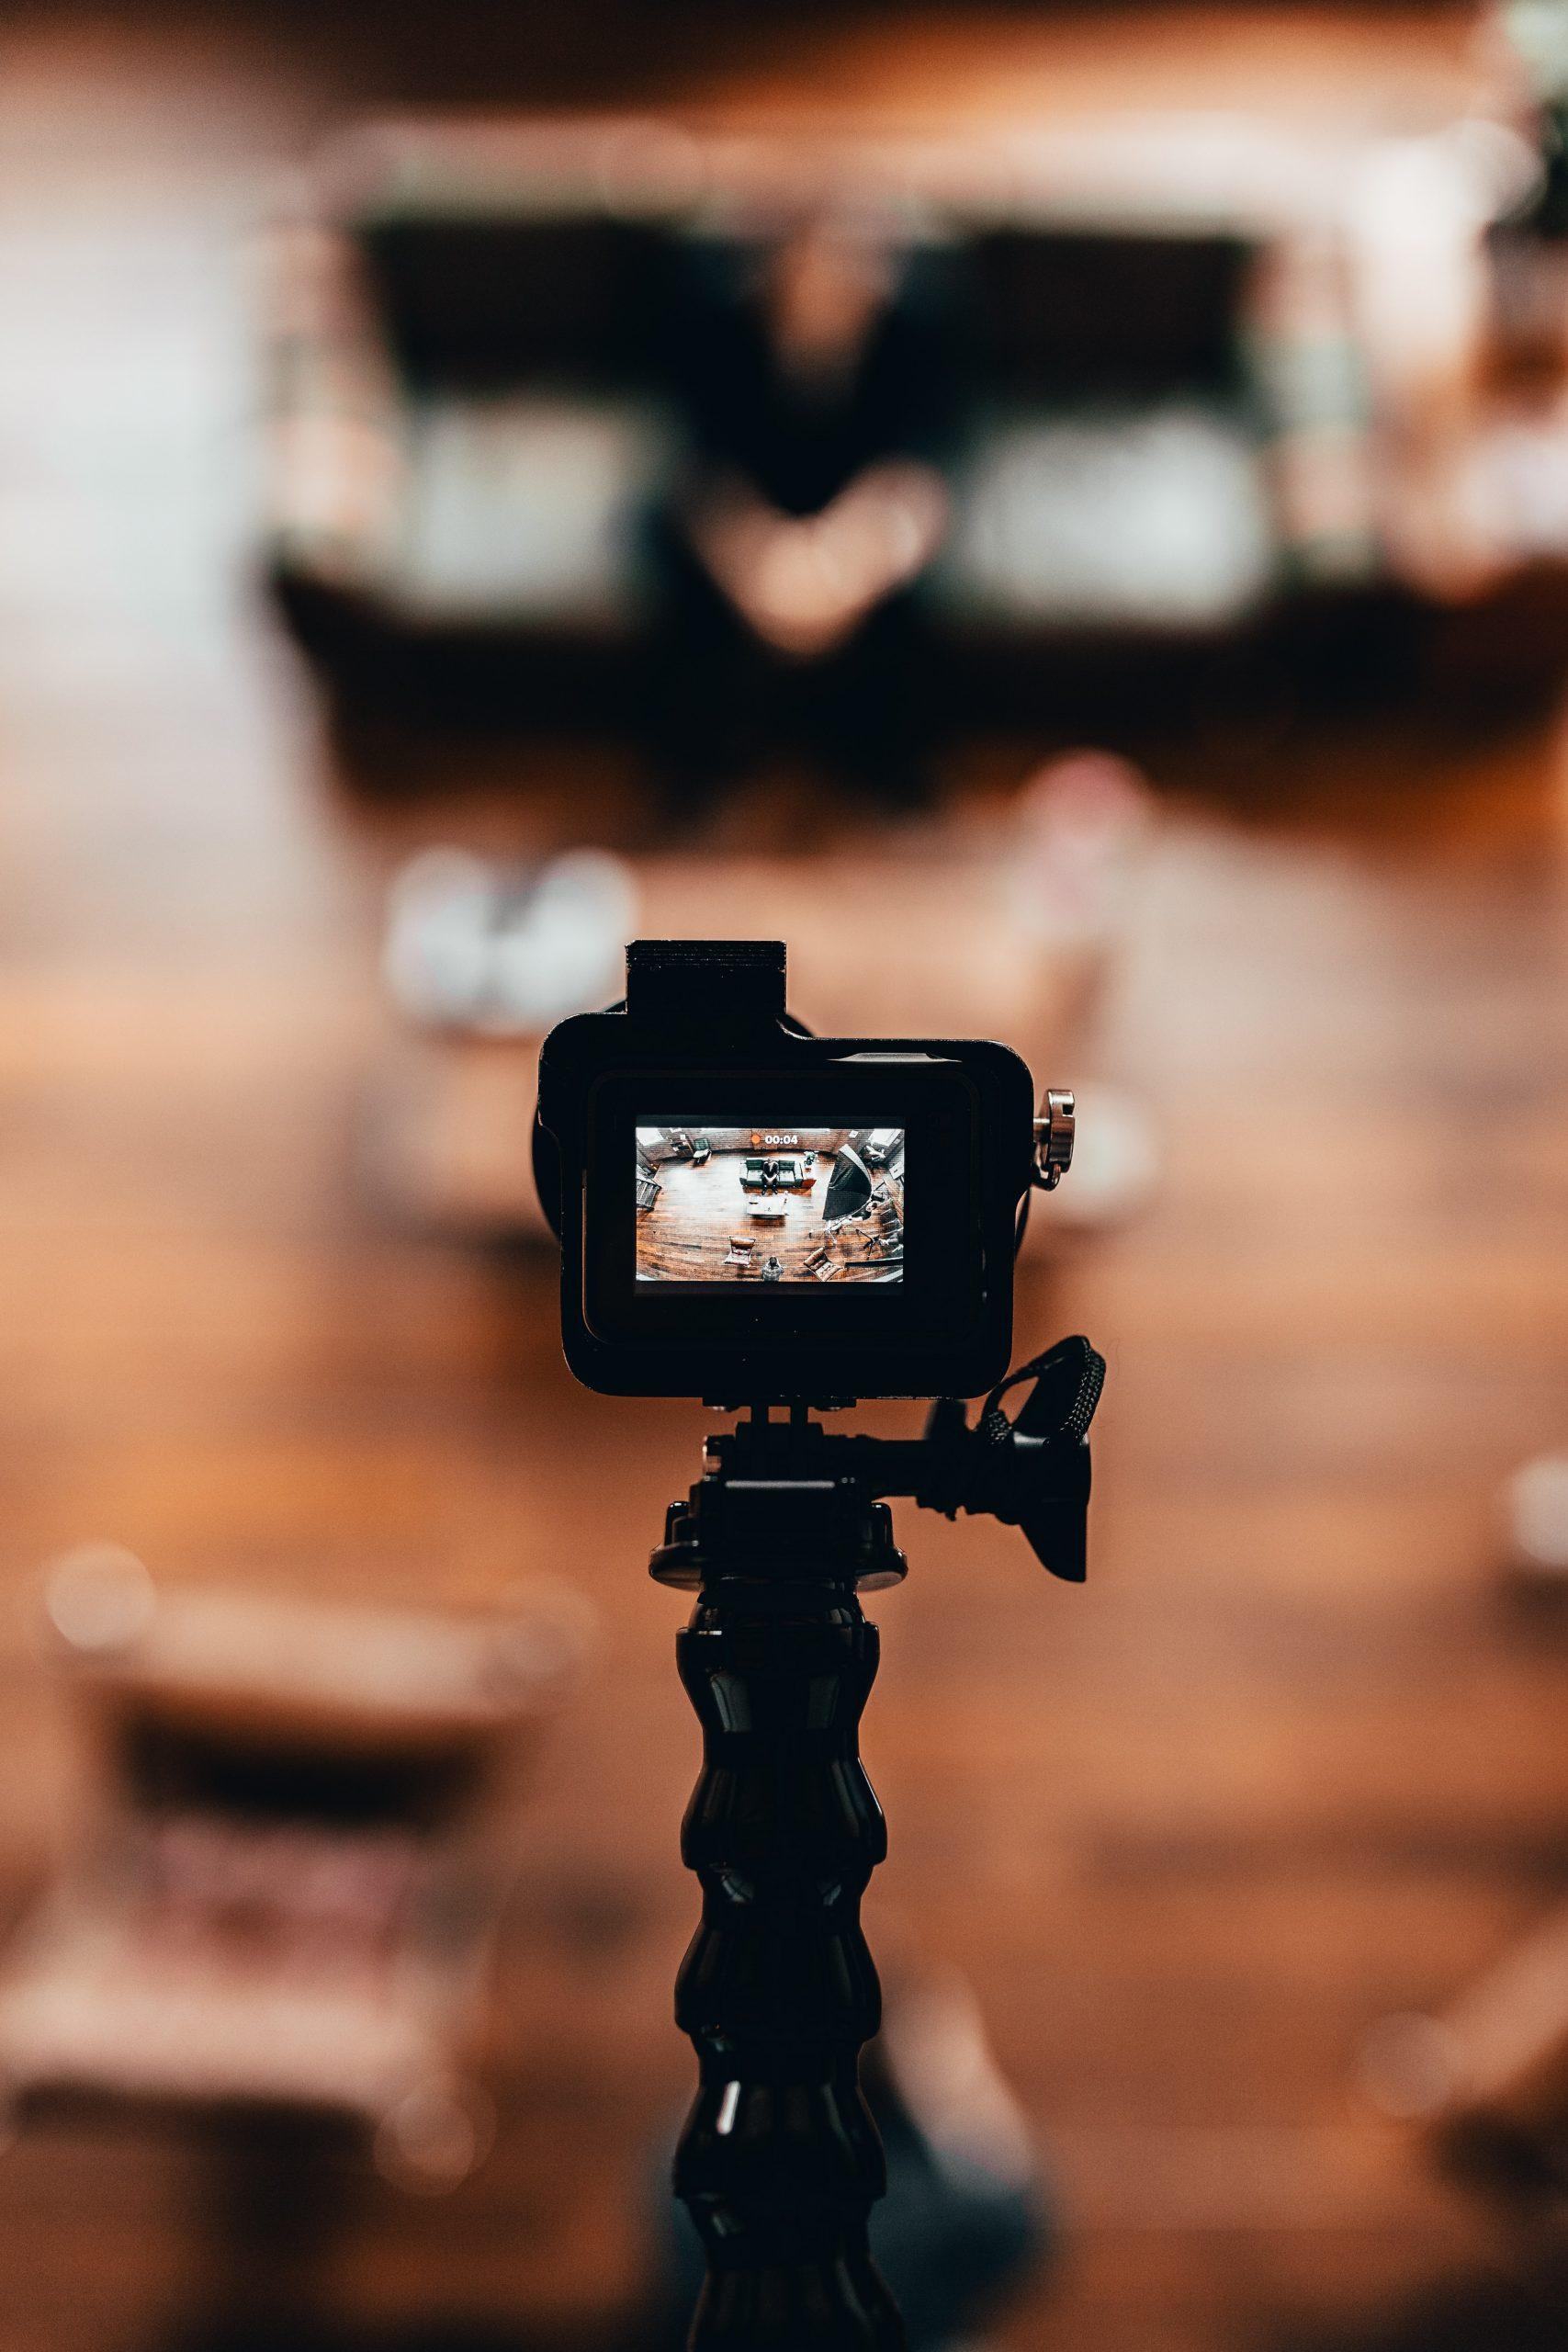 Videography Camera 2